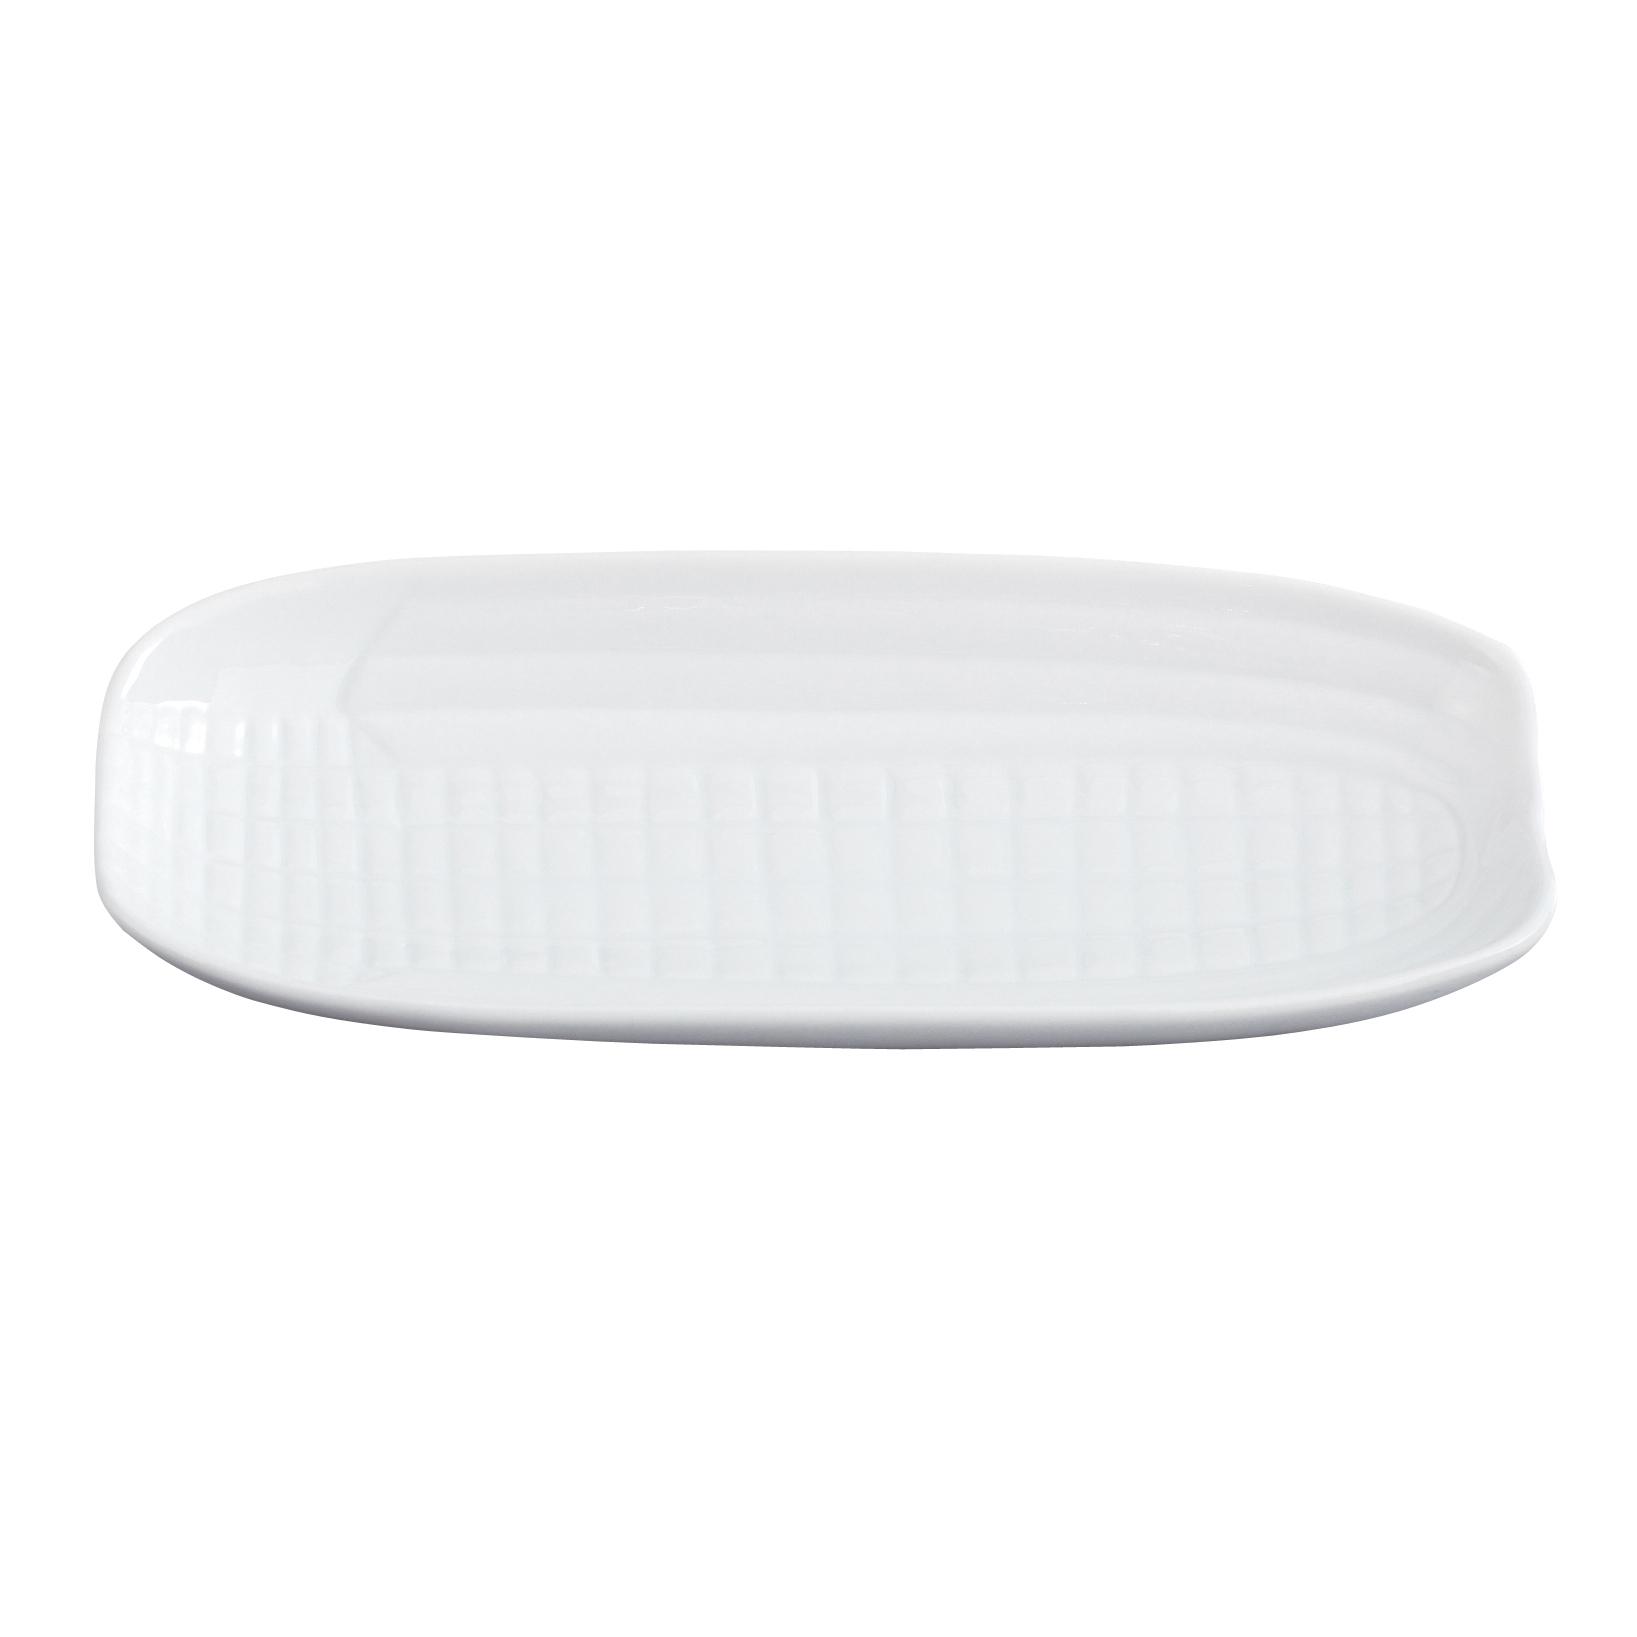 White Porcelain Corn Cob Tray